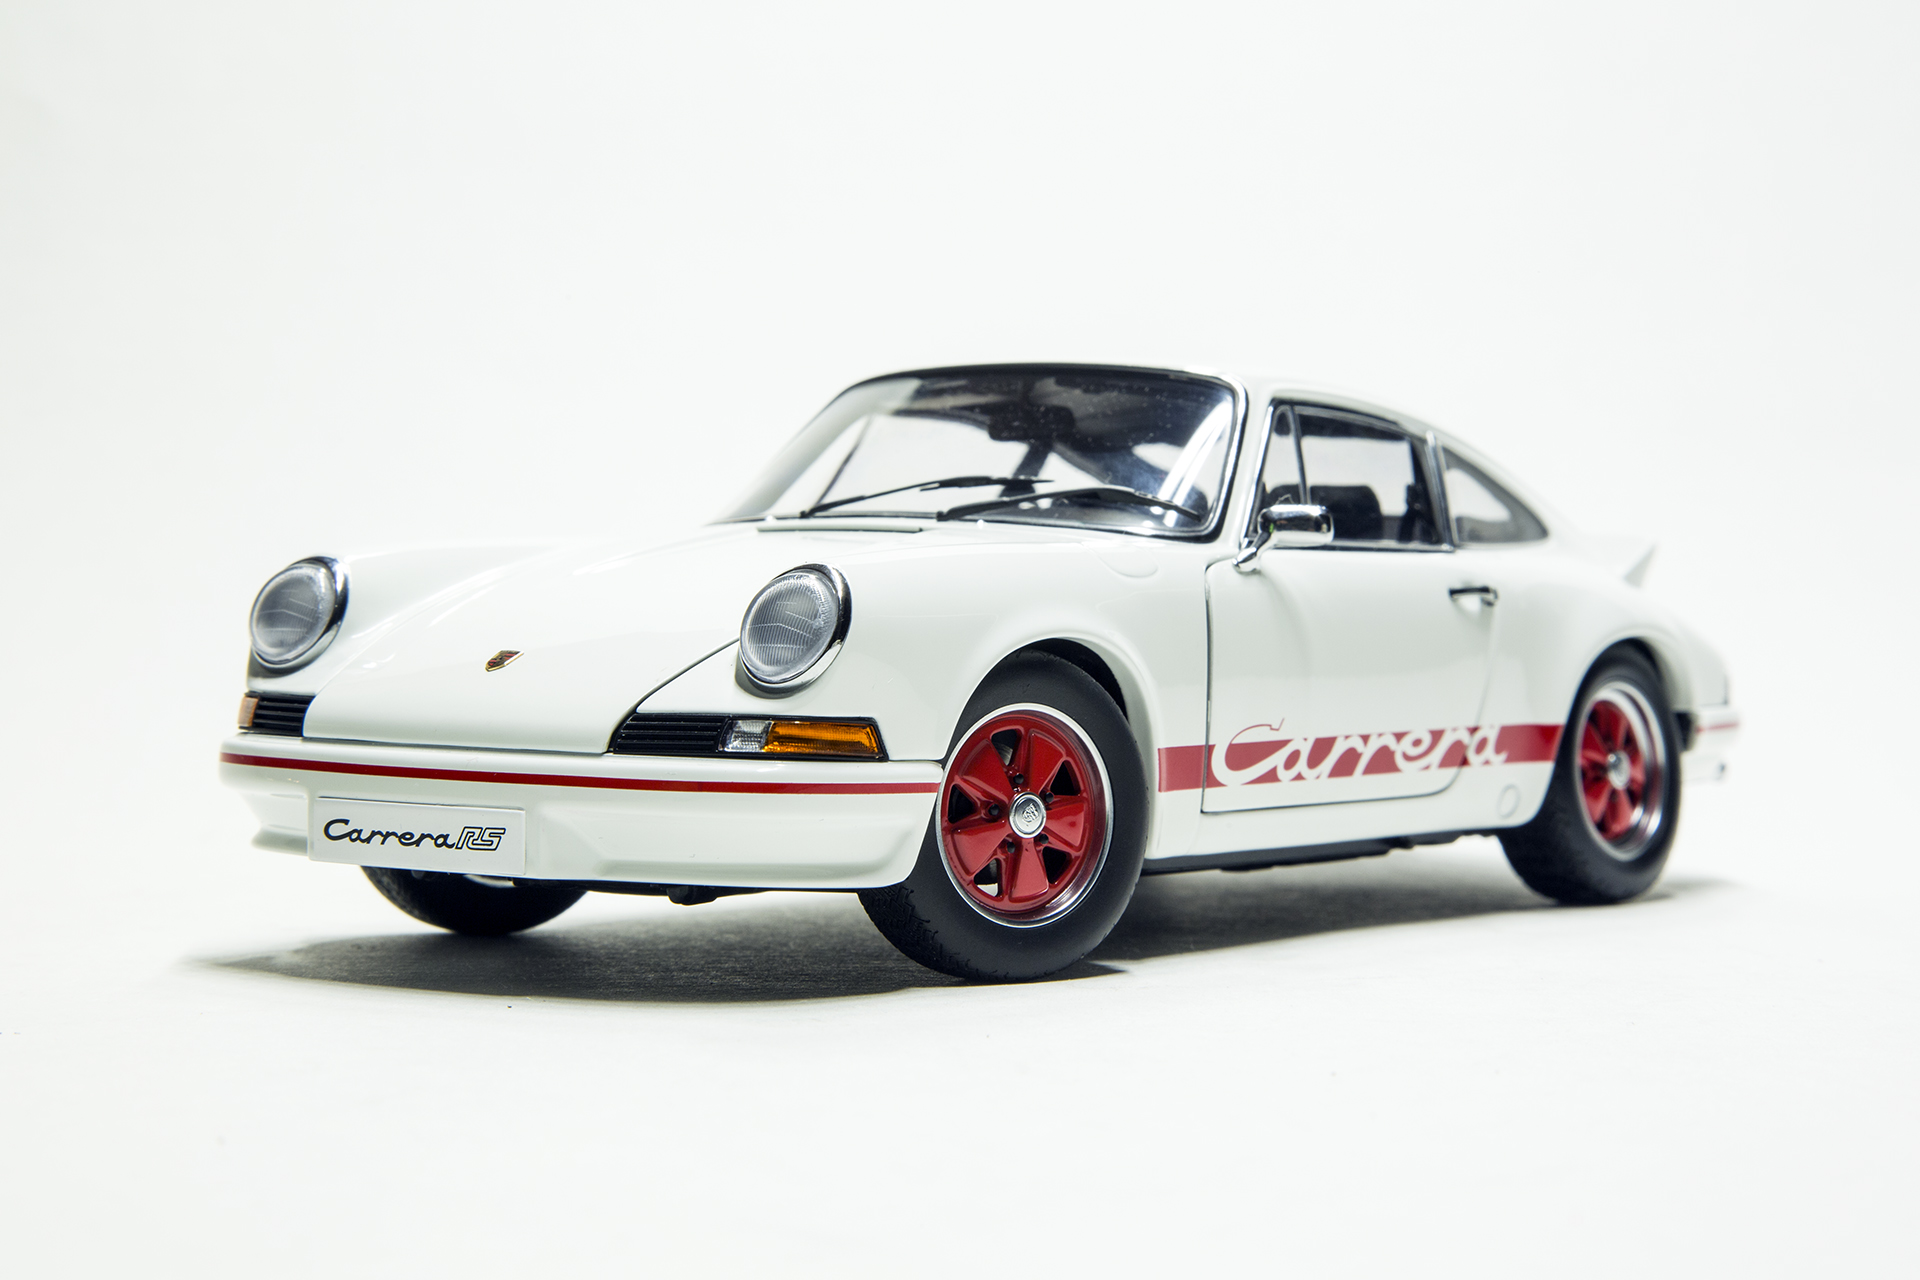 2015-light green with White Stripes Minichamps 1:18 Porsche 911 gt3 RS 991